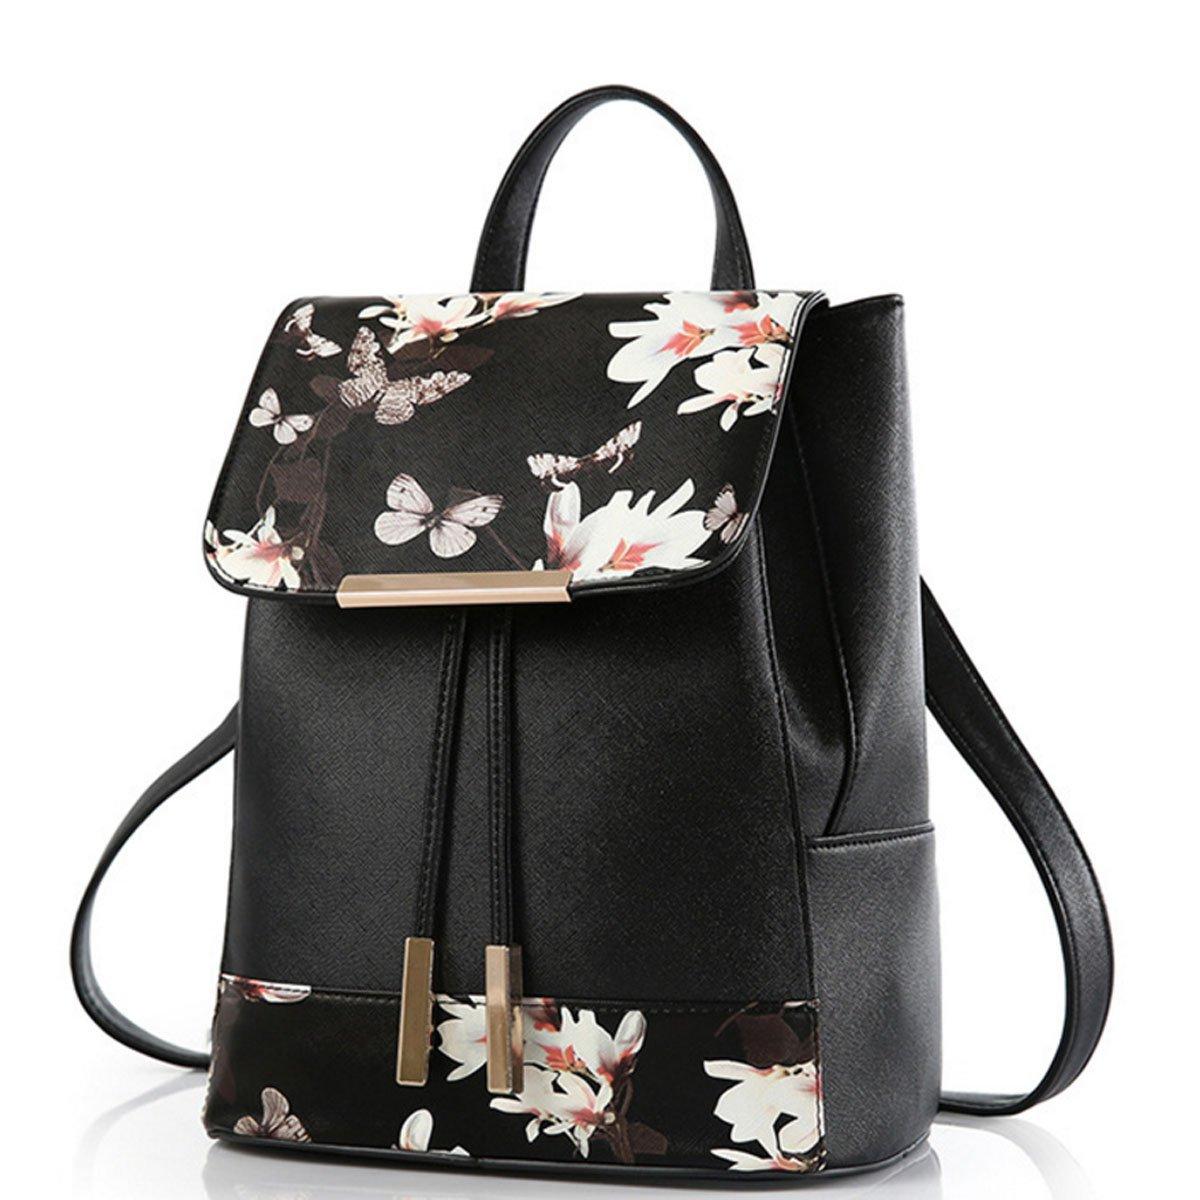 WINK KANGAROO Fashion Shoulder Bag Rucksack PU Leather Women Girls Ladies Backpack Travel bag (Butterfly B)